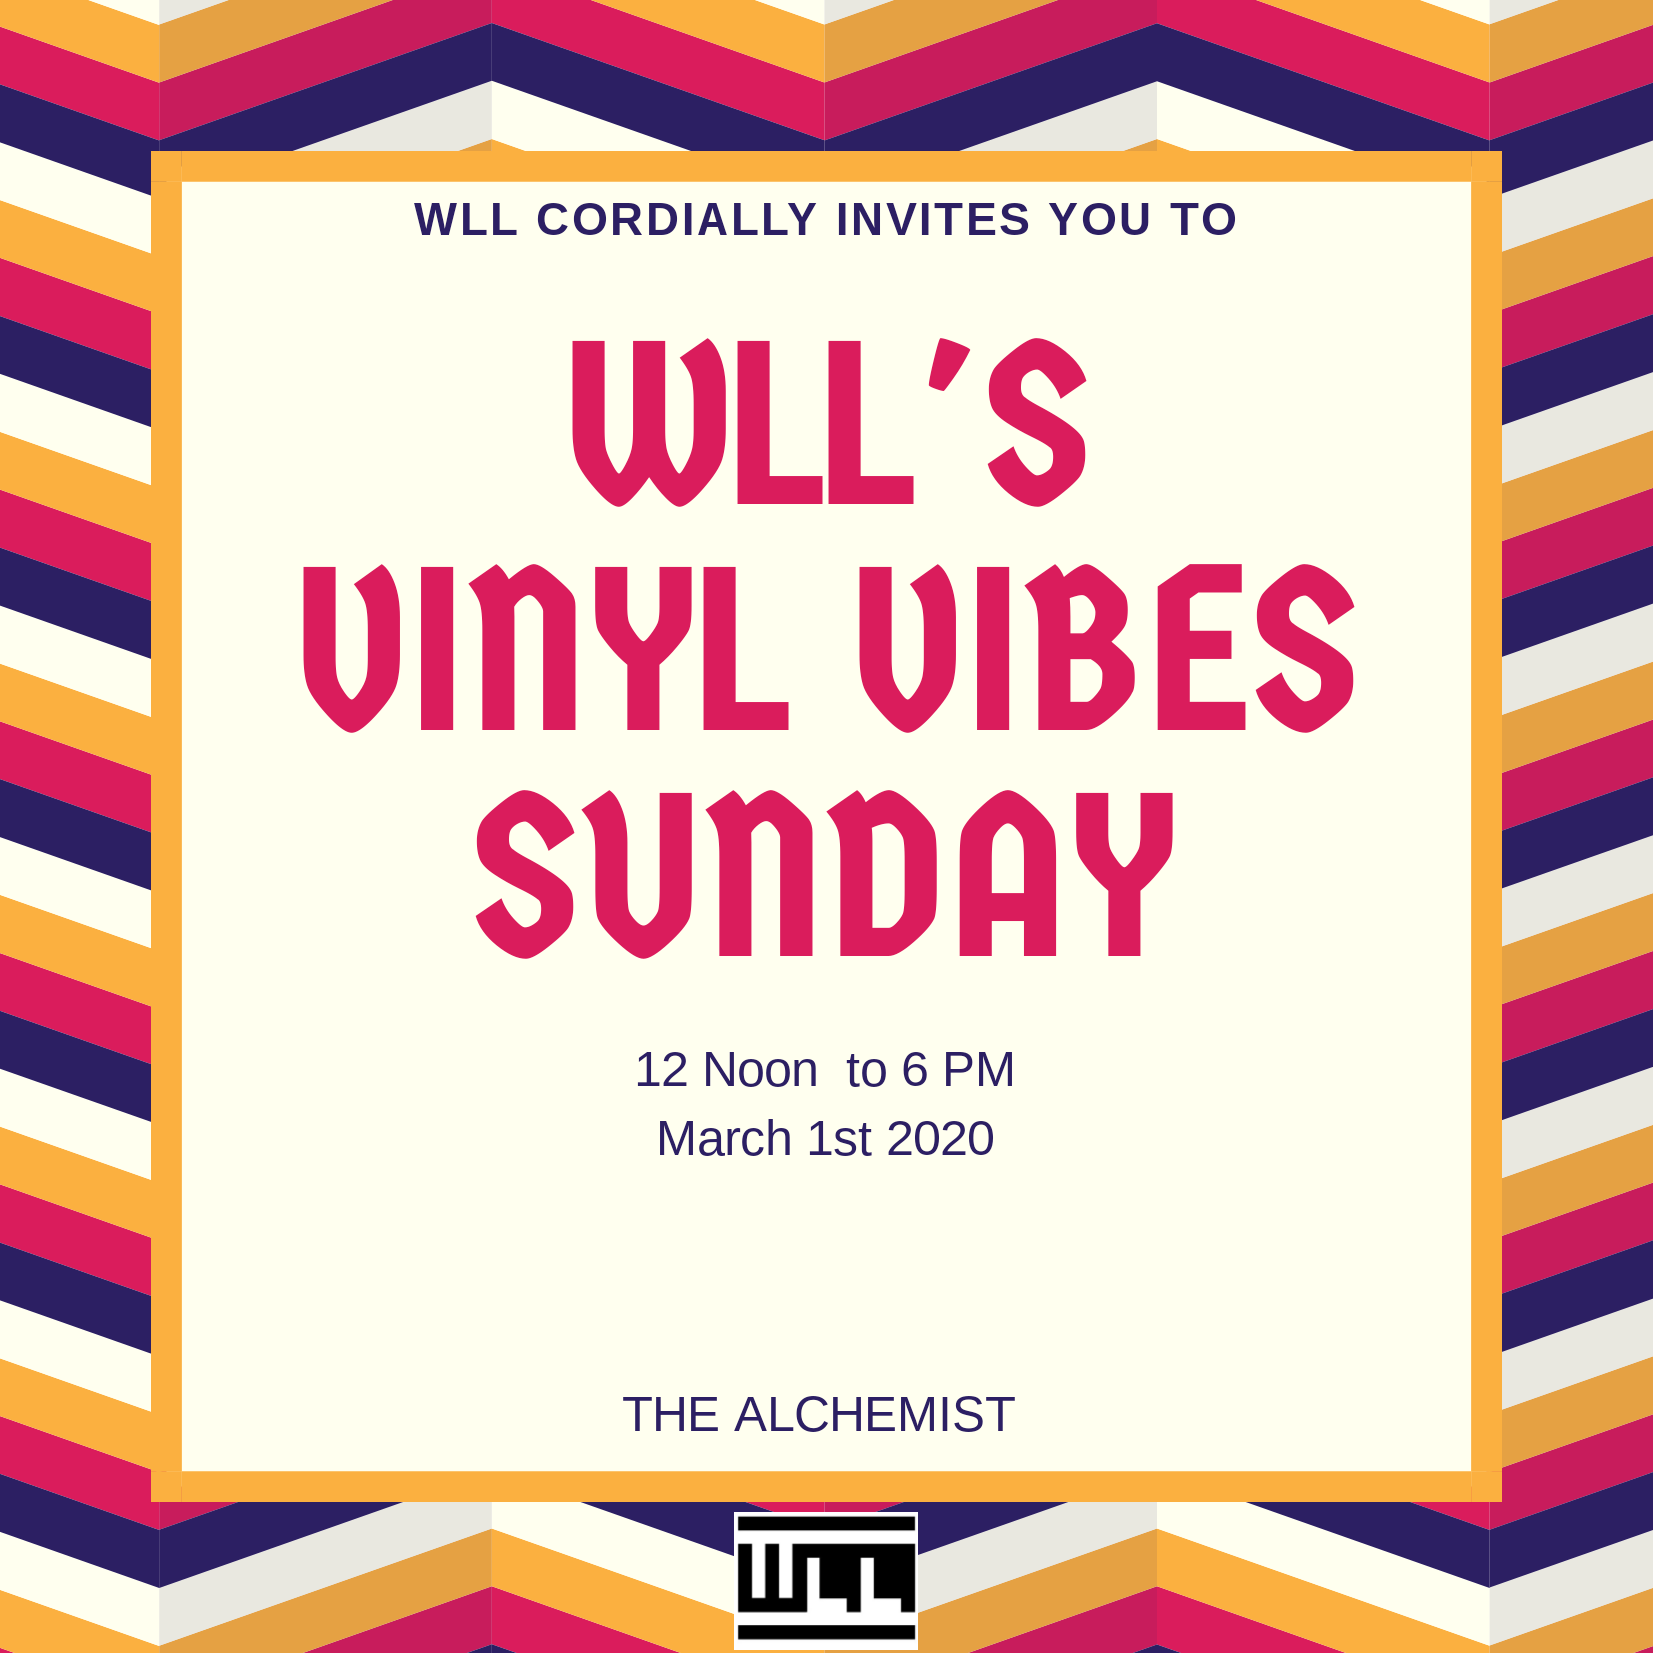 WLL's Vinyl Vibes Sunday